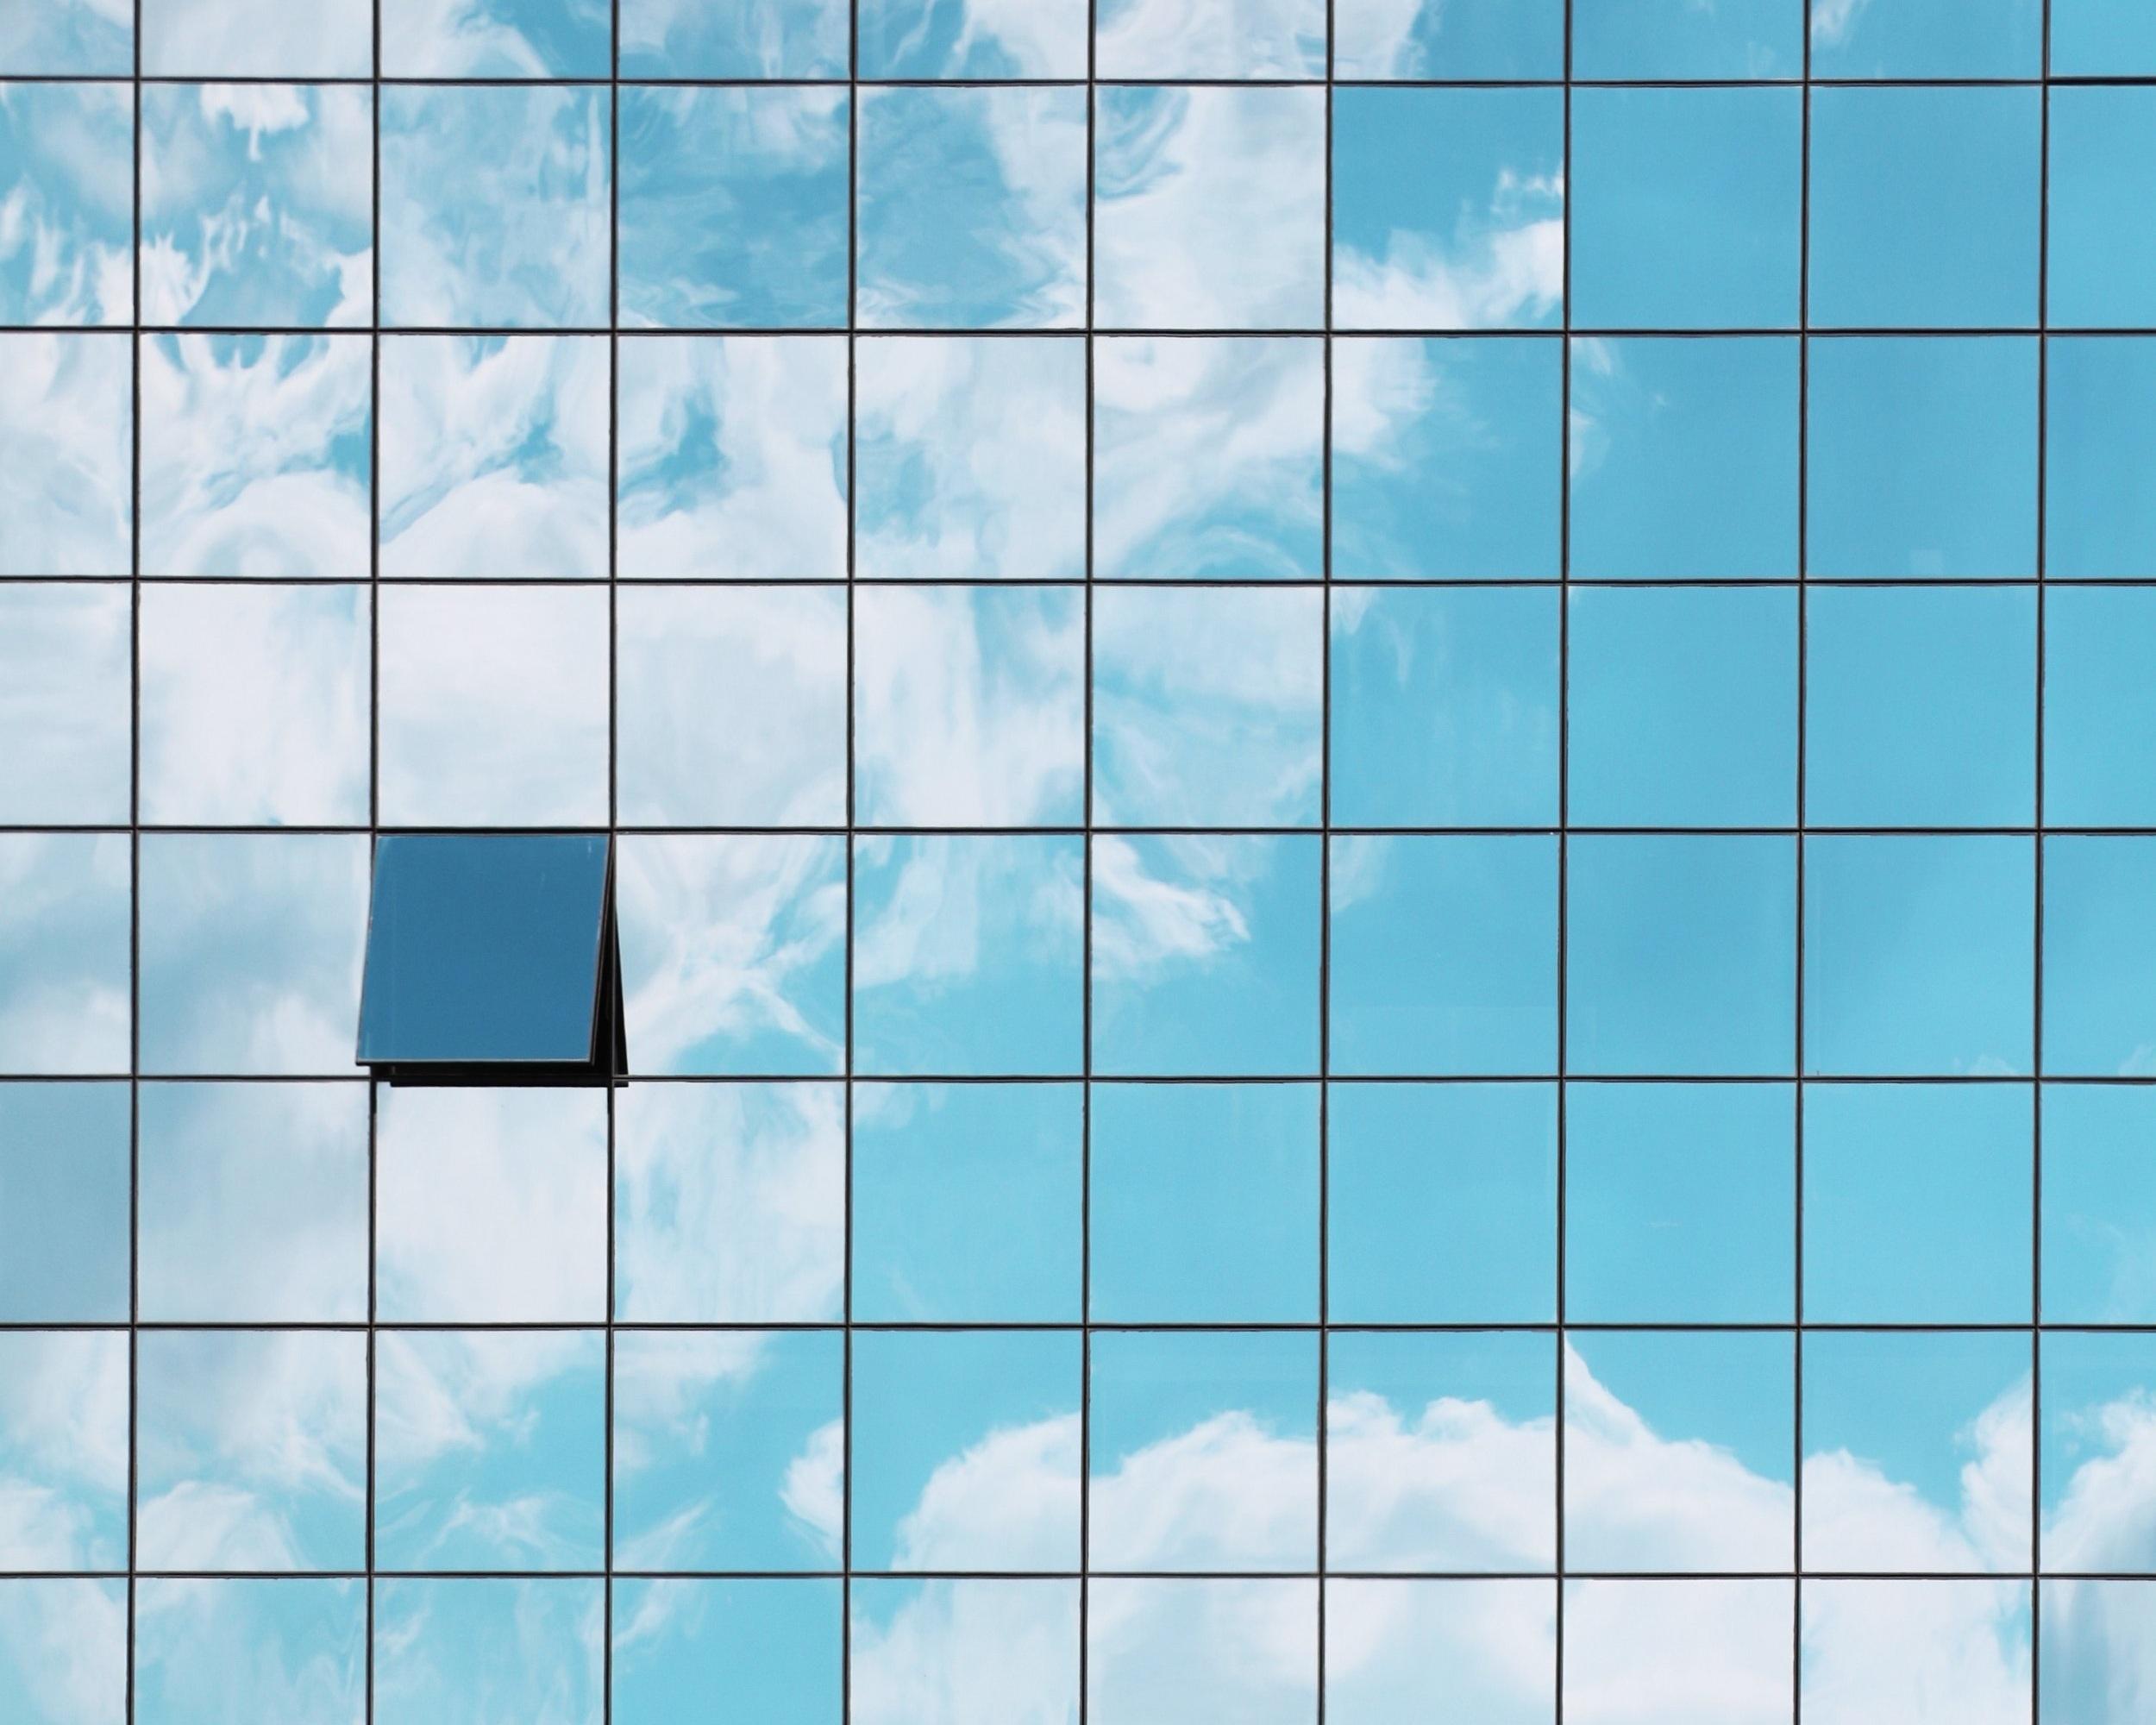 3 Ways The Cloud Can Complicate DevOps Adoption